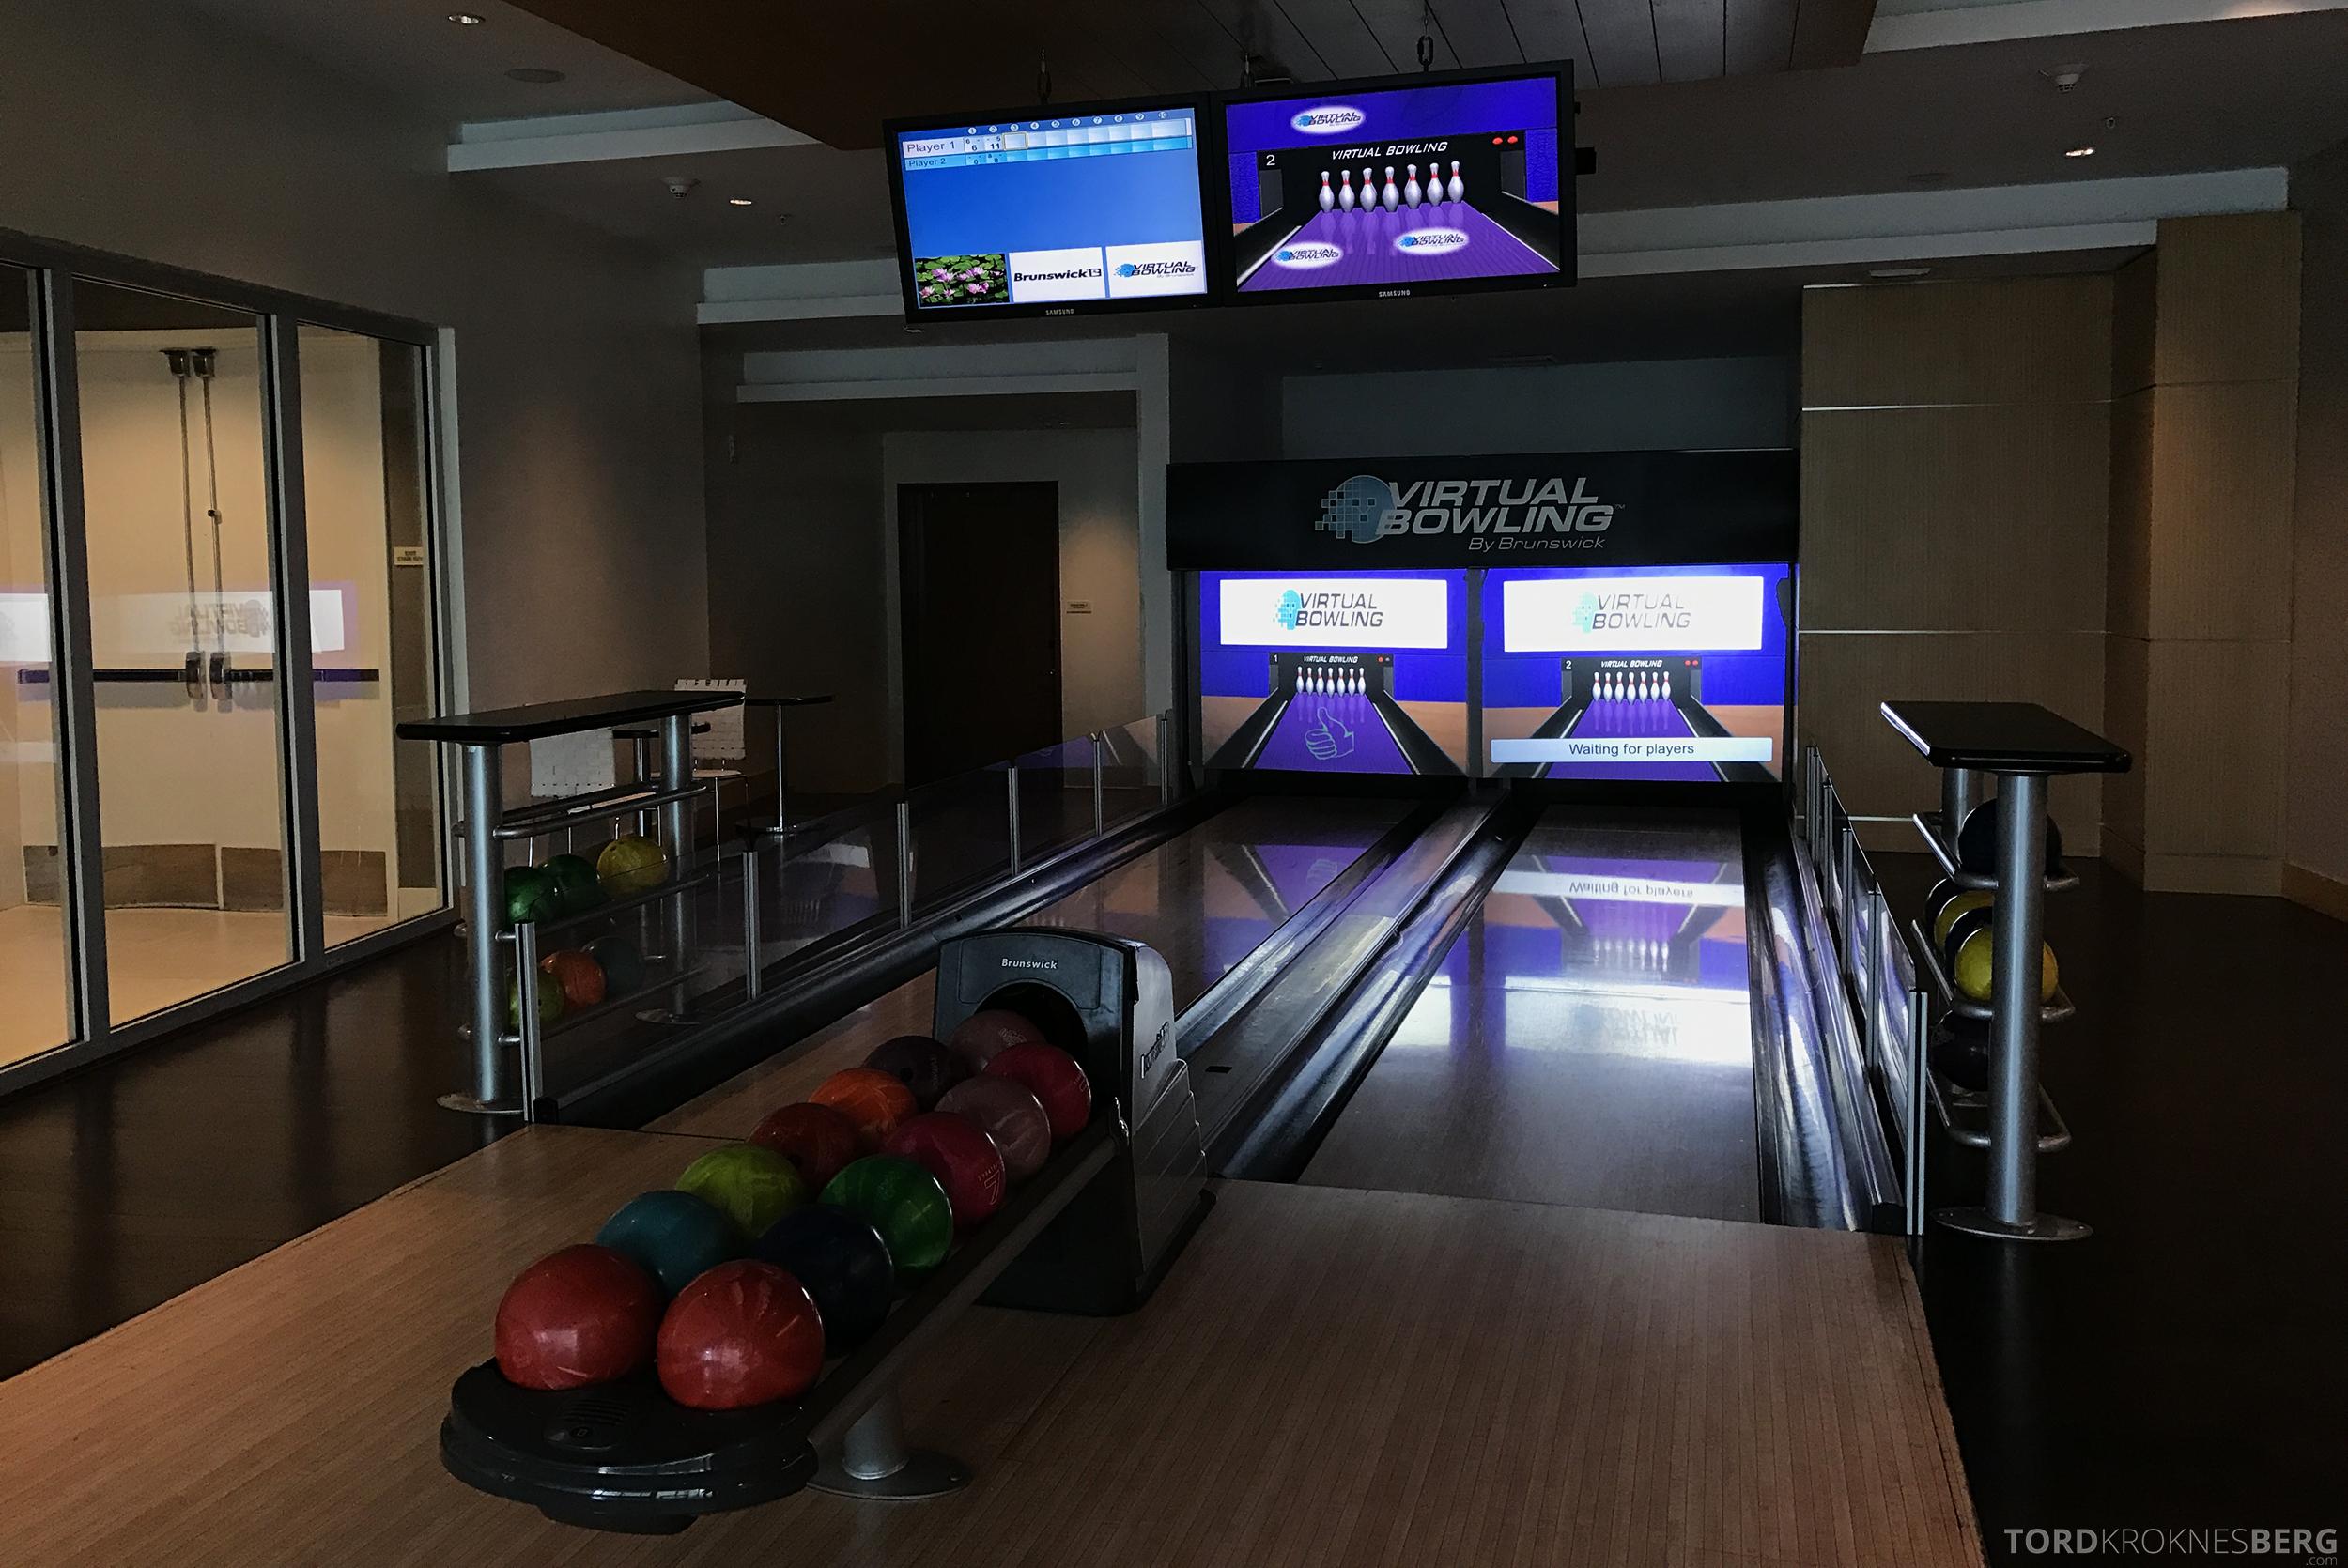 JW Marriott Marquis Miami bowling